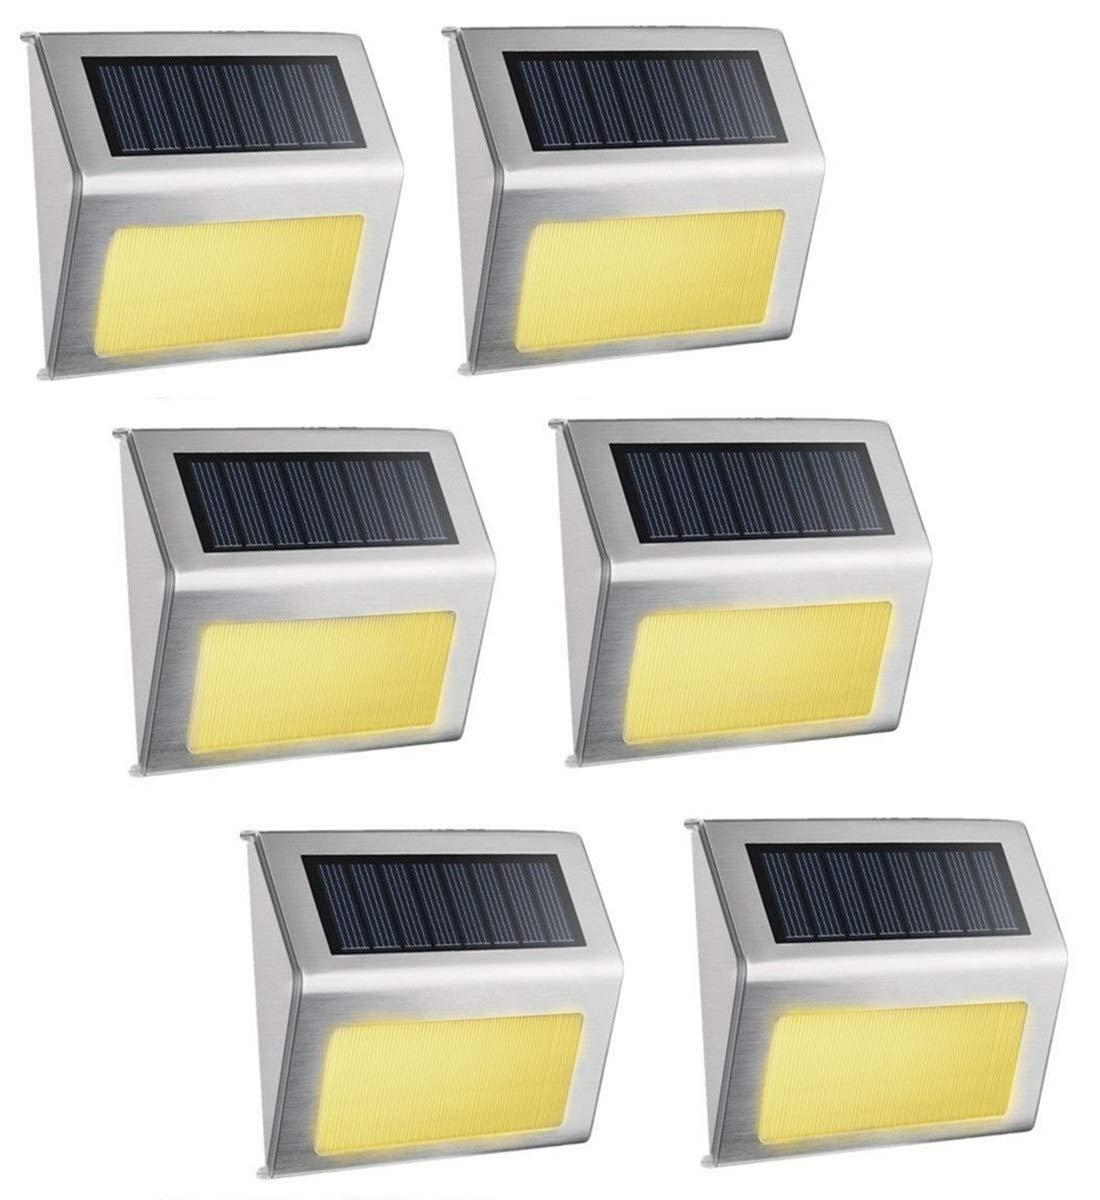 Warm White Solar Light, SimPra Outdoor Stainless Steel LED Solar Step Light Illuminates Stairs, Deck, Patio, Etc Warm White 6 Pack